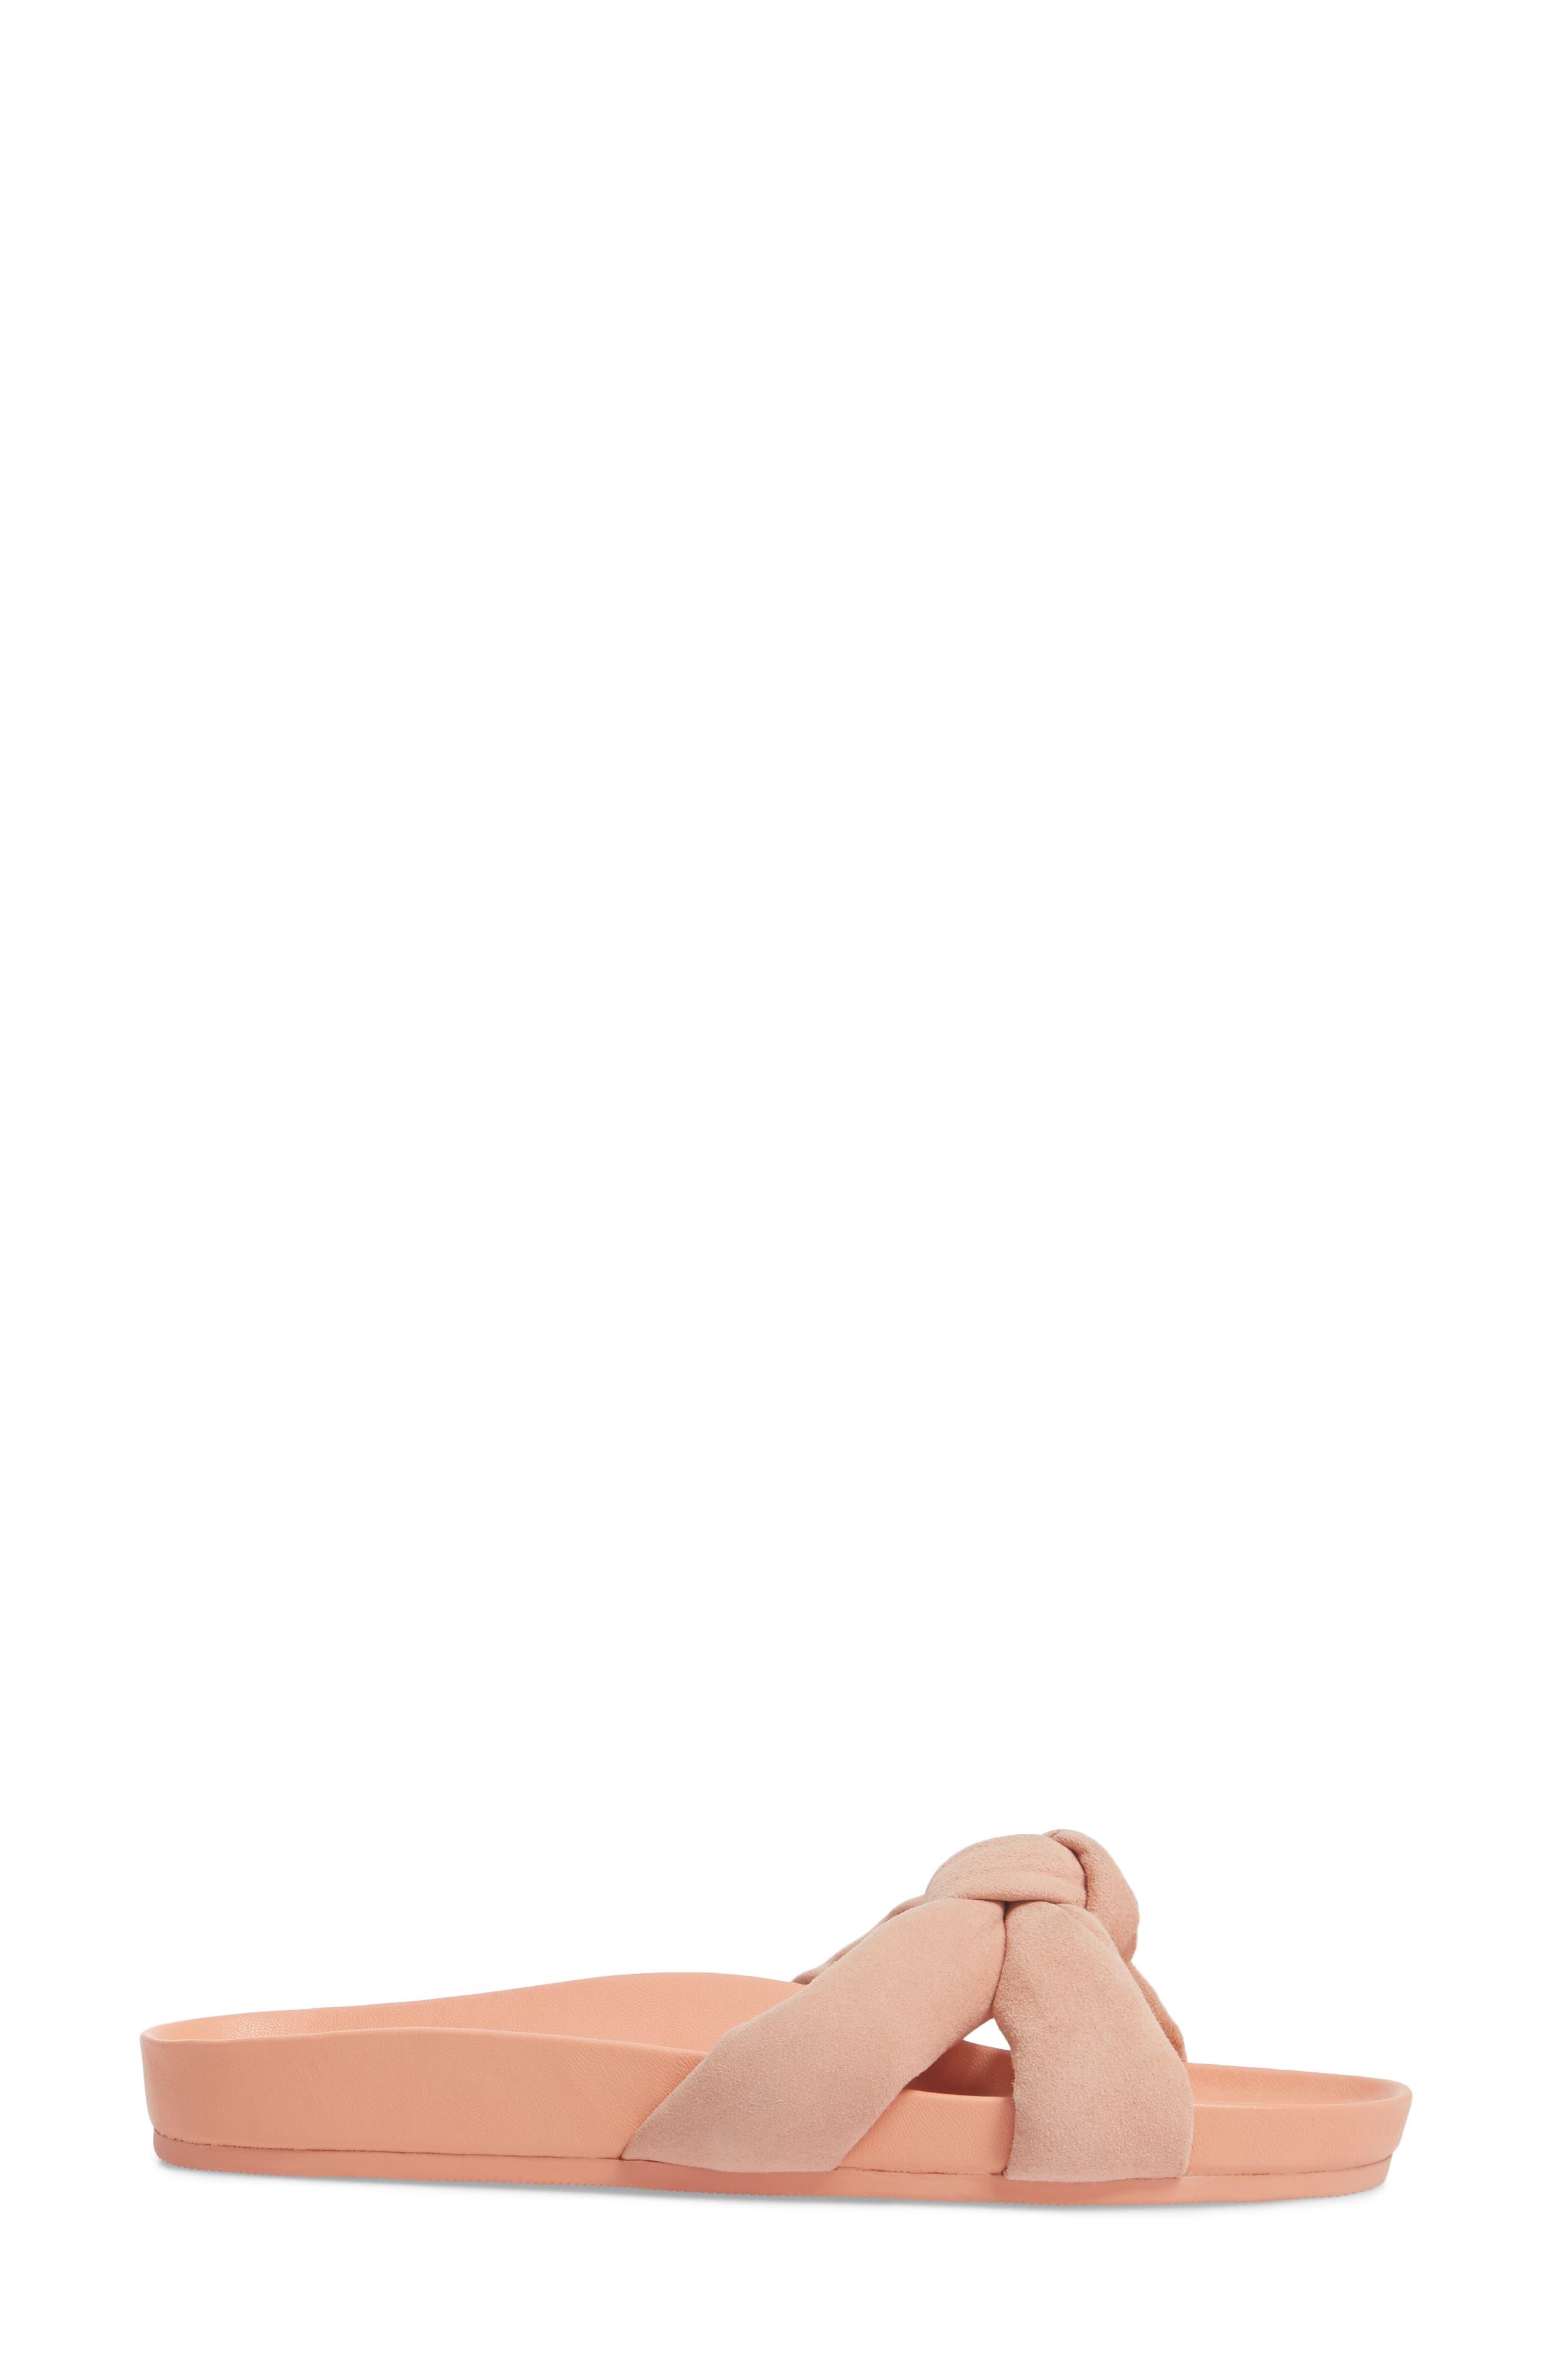 Gertie Knotted Slide Sandal,                             Alternate thumbnail 3, color,                             MELON